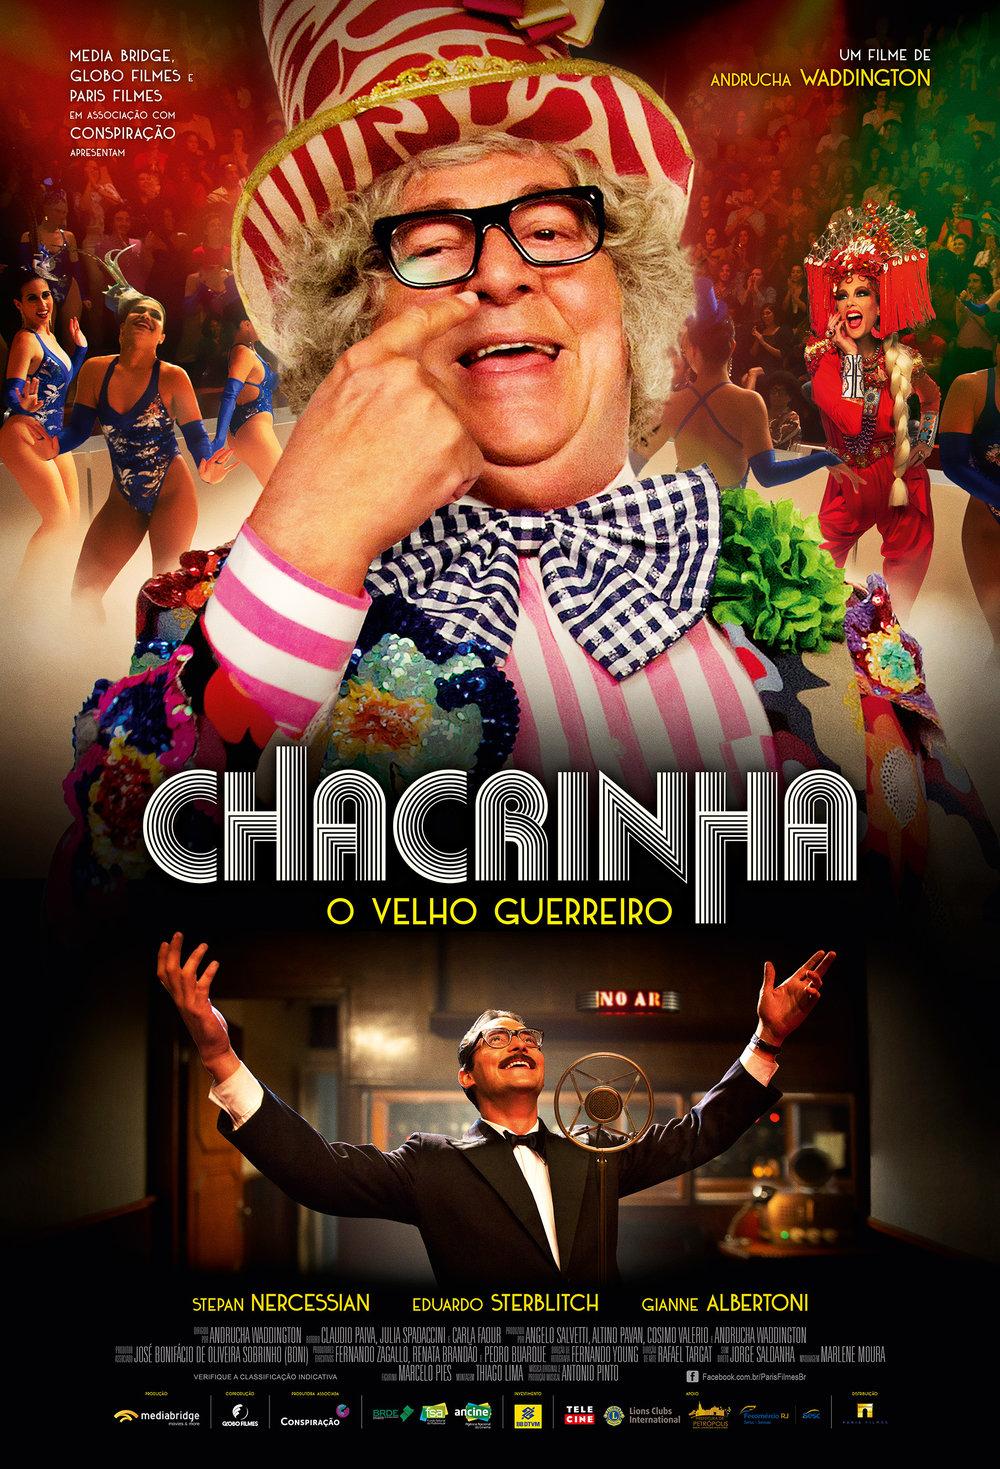 cartaz Chacrinha.jpg